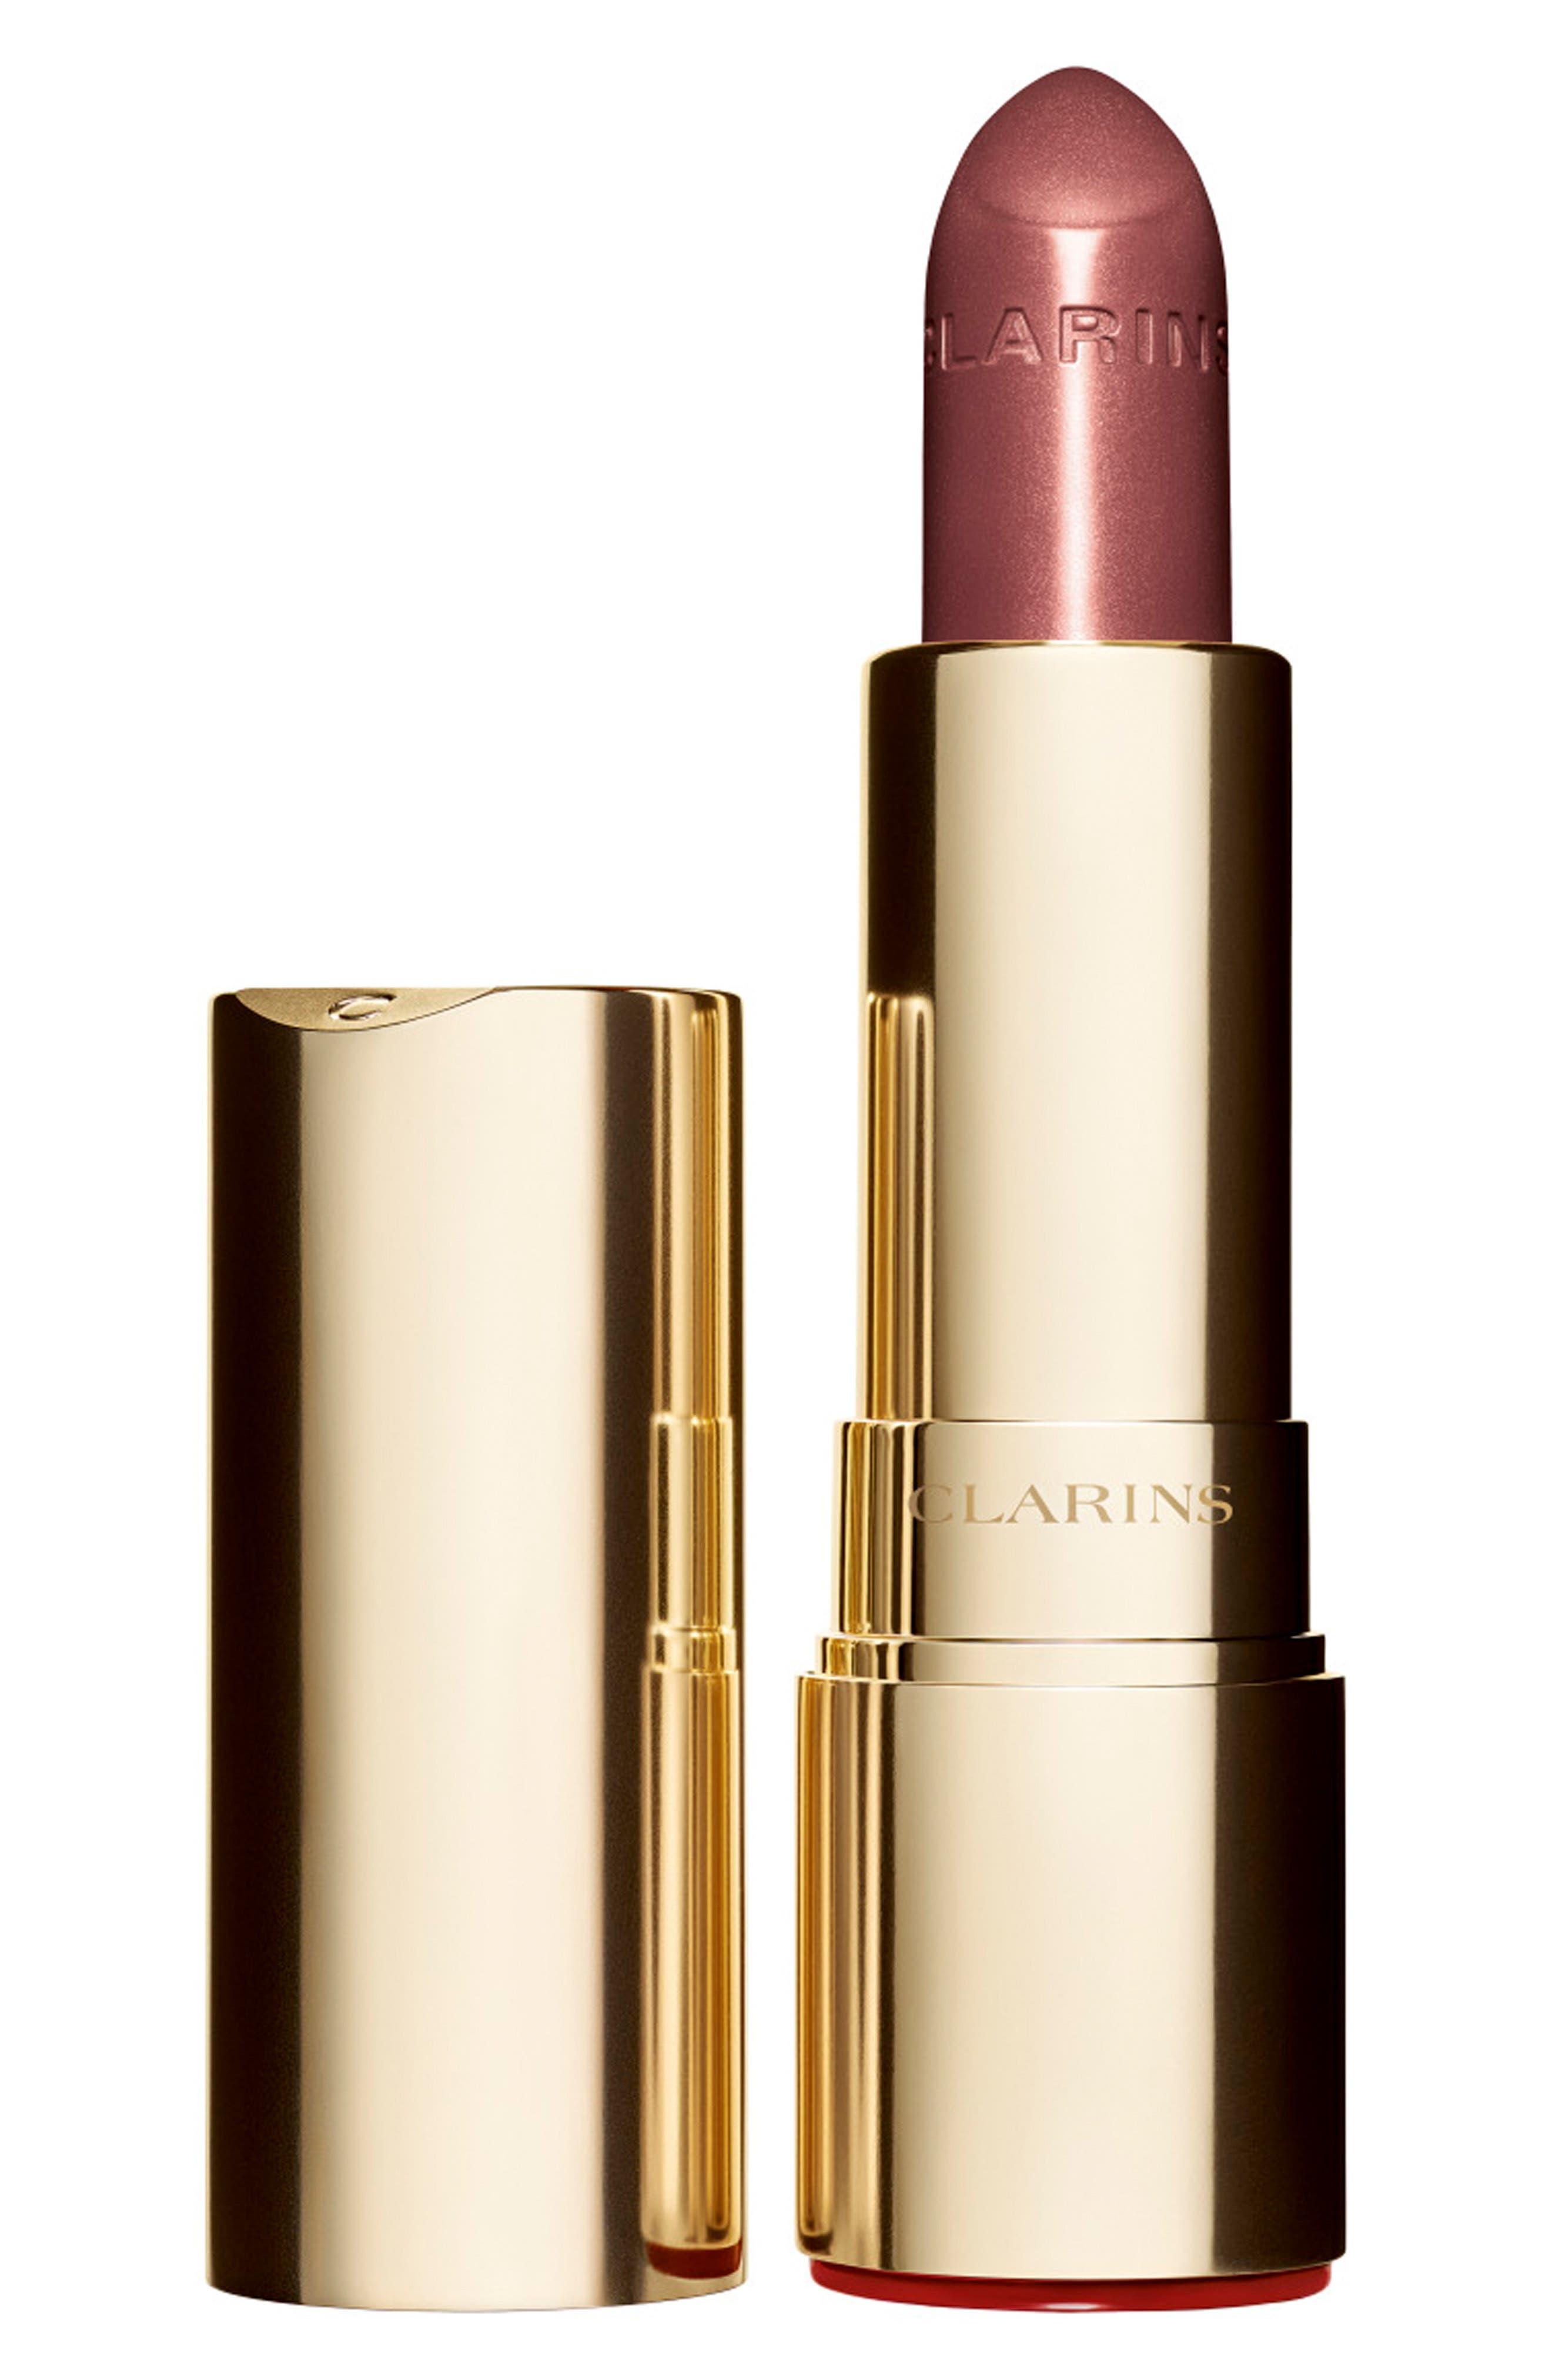 CLARINS, Joli Rouge Brilliant Sheer Lipstick, Main thumbnail 1, color, 757 NUDE BRICK